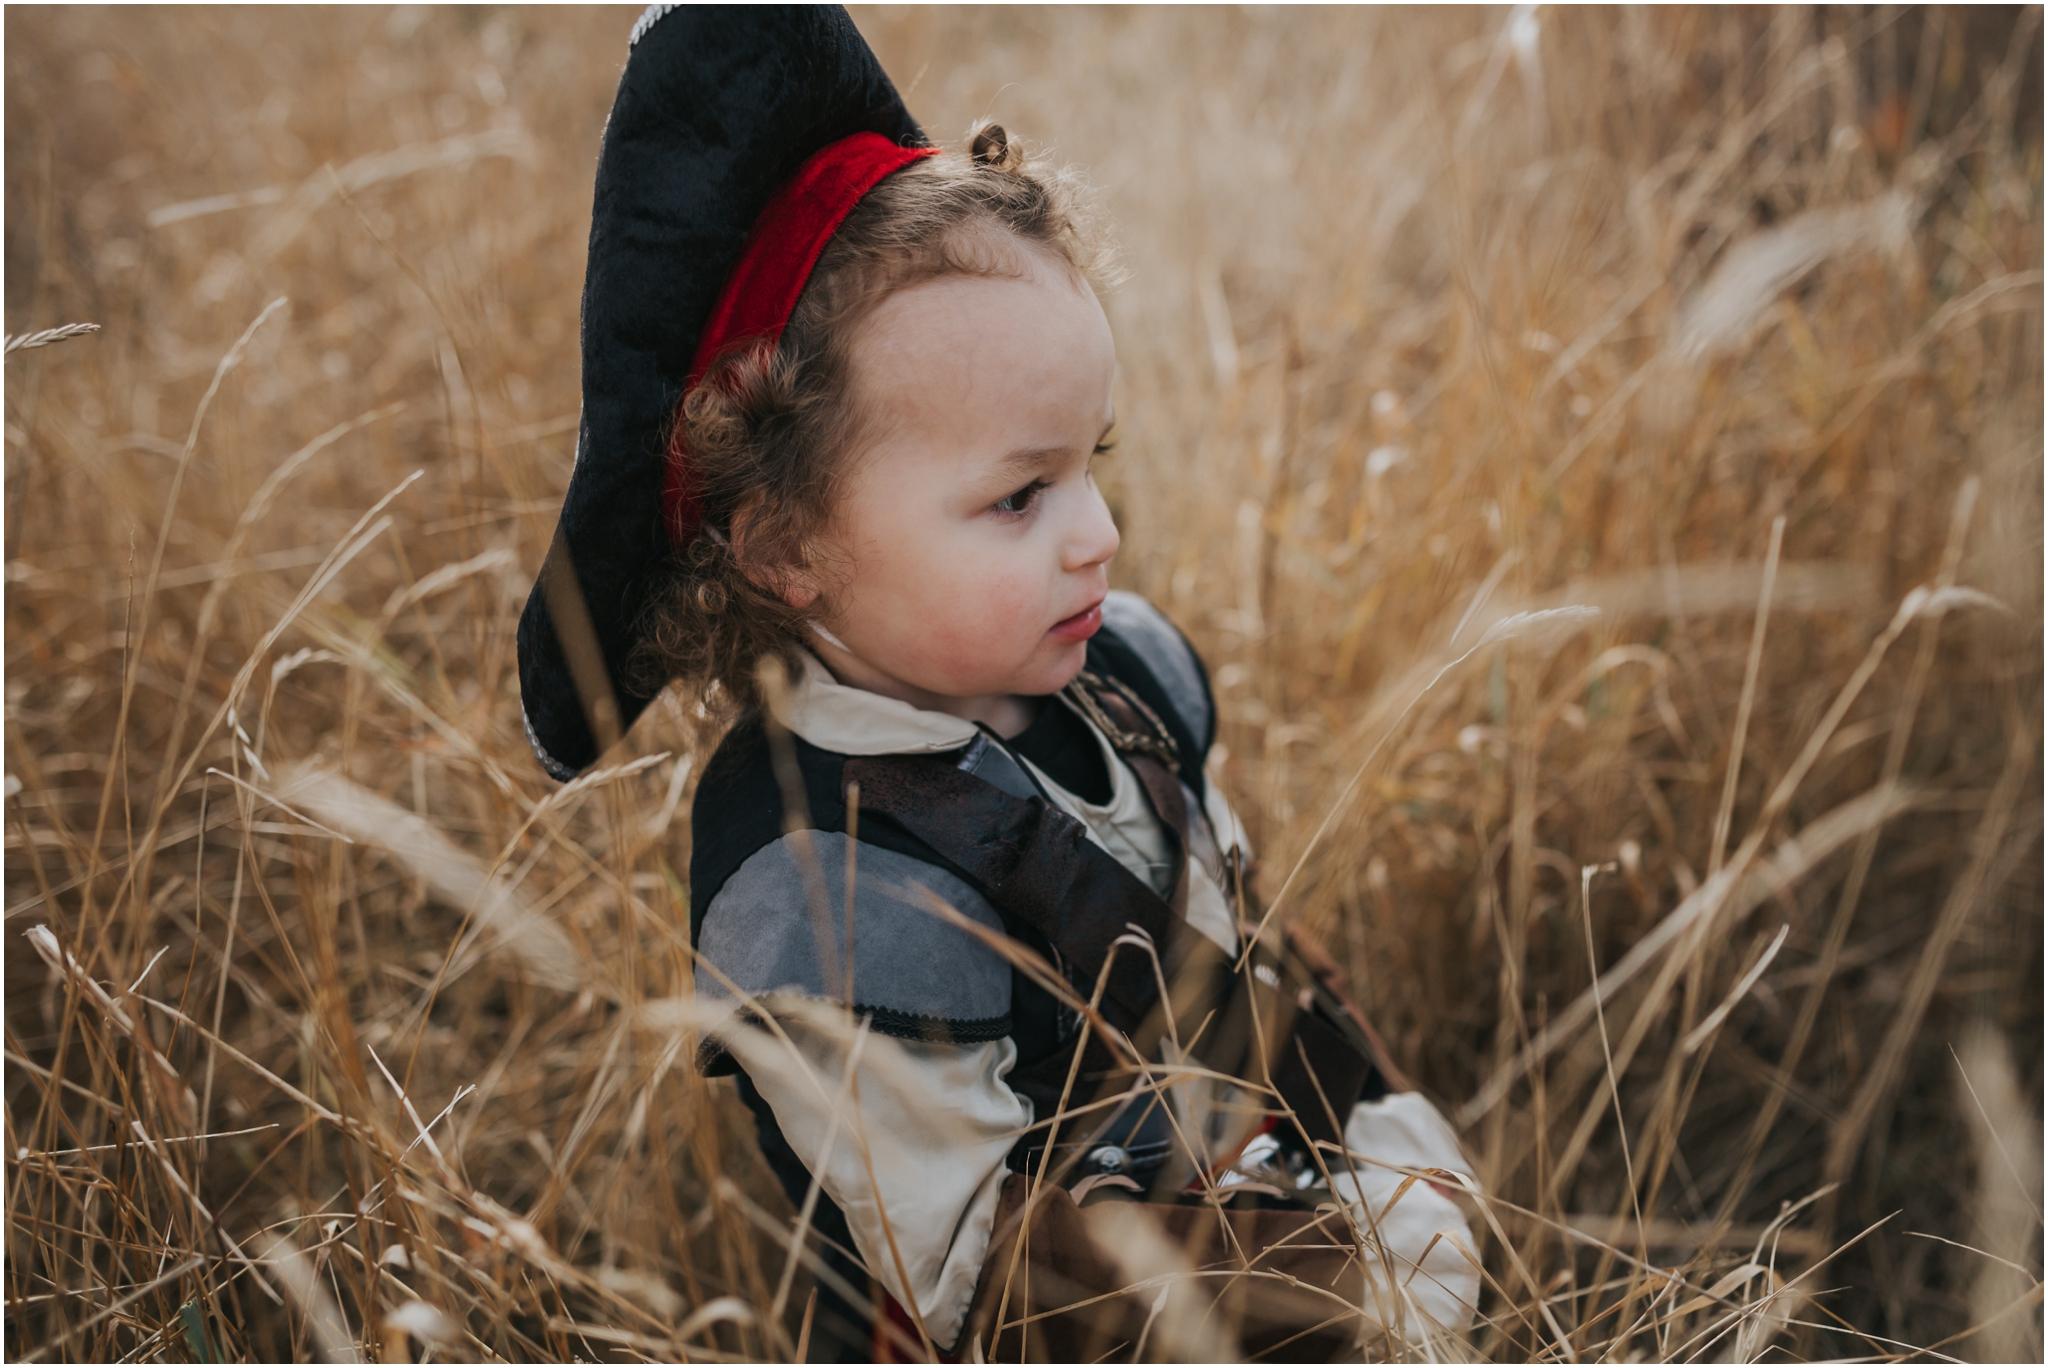 Edmonton Family Lifestyle Photographer - Fall Photography Session Autumn Halloween - Pirate costume